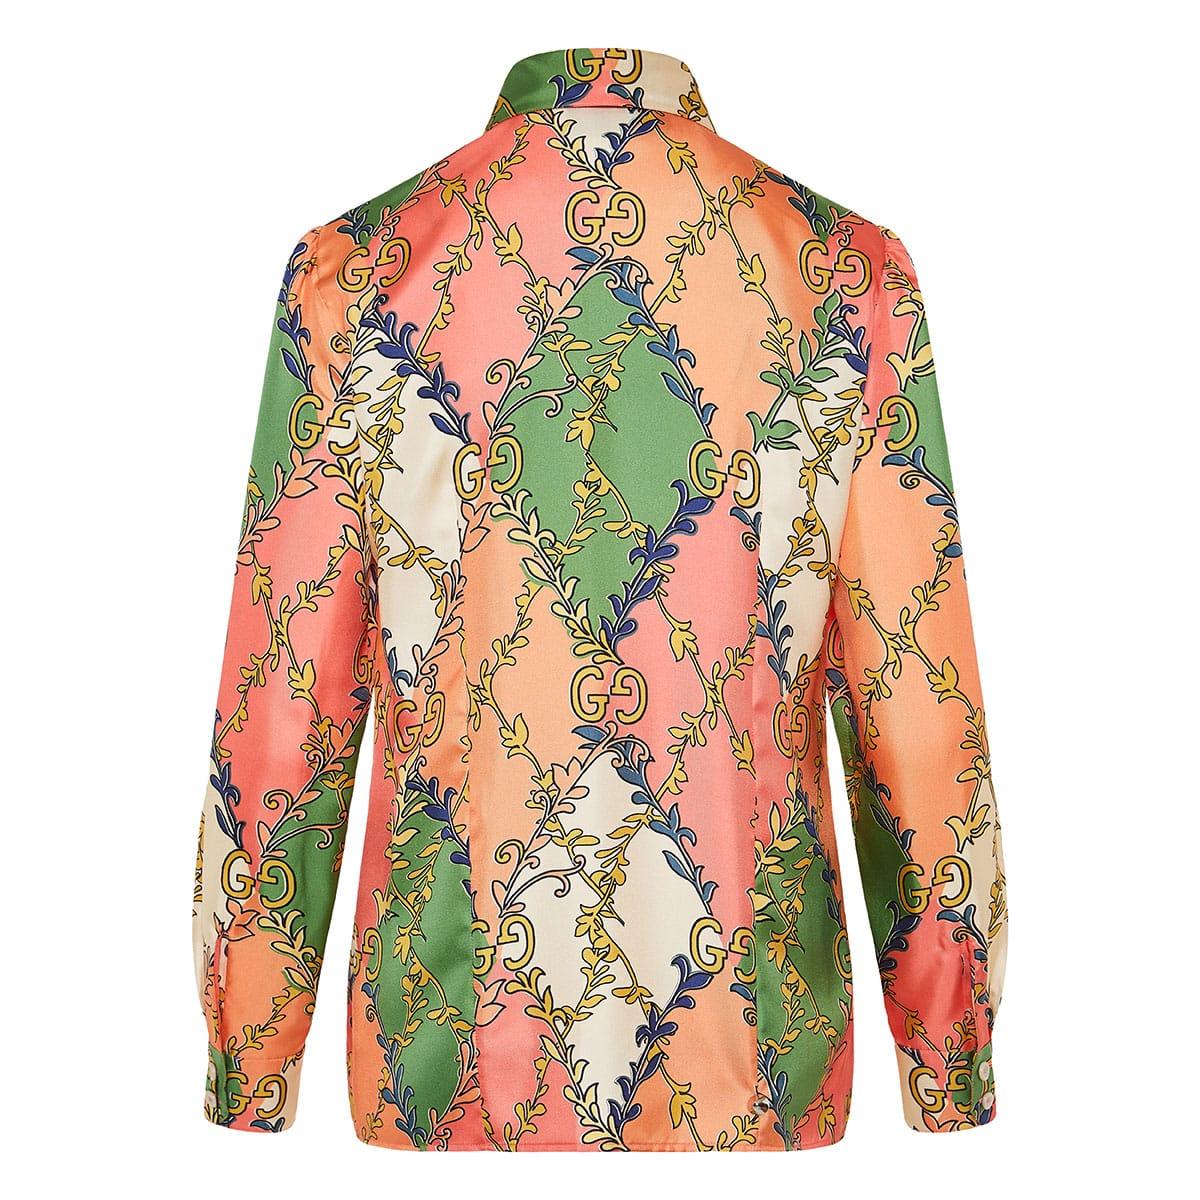 Bow-tie GG printed silk shirt